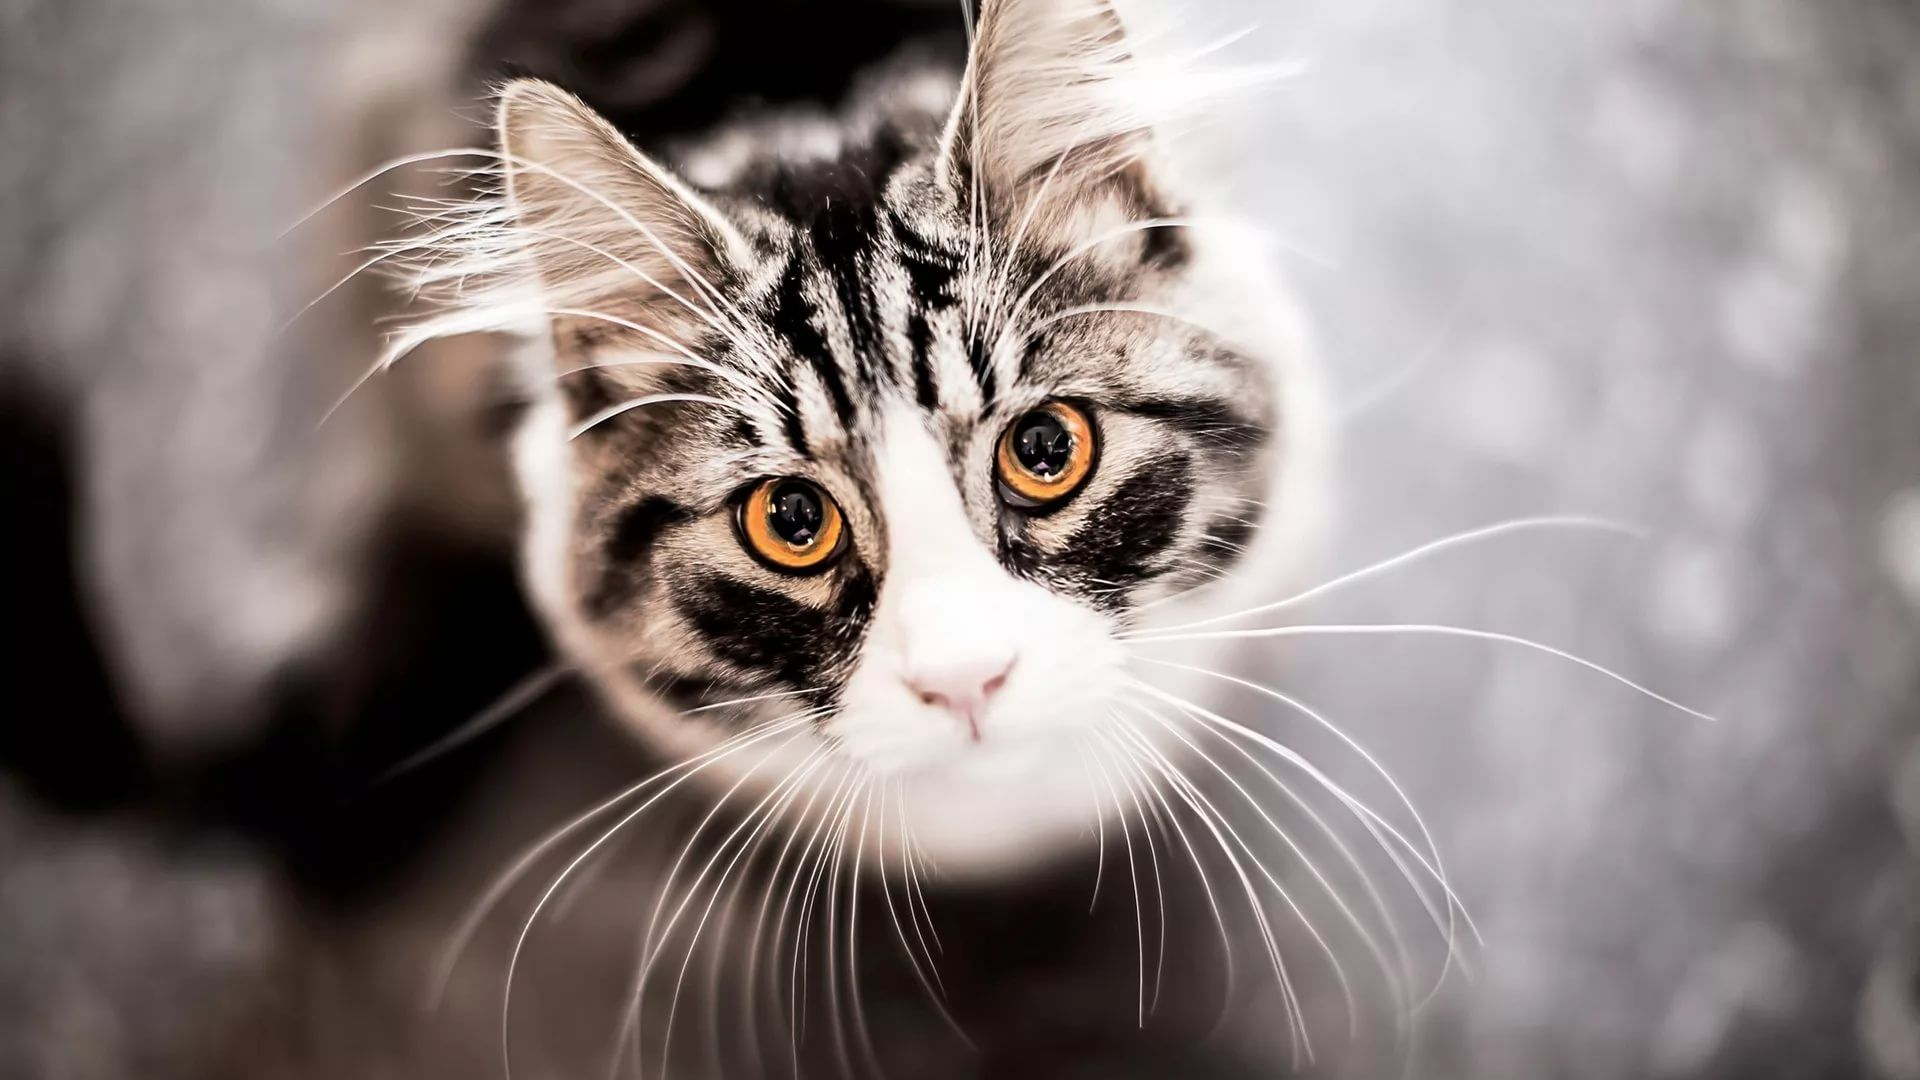 Lovely Cat beautiful wallpaper